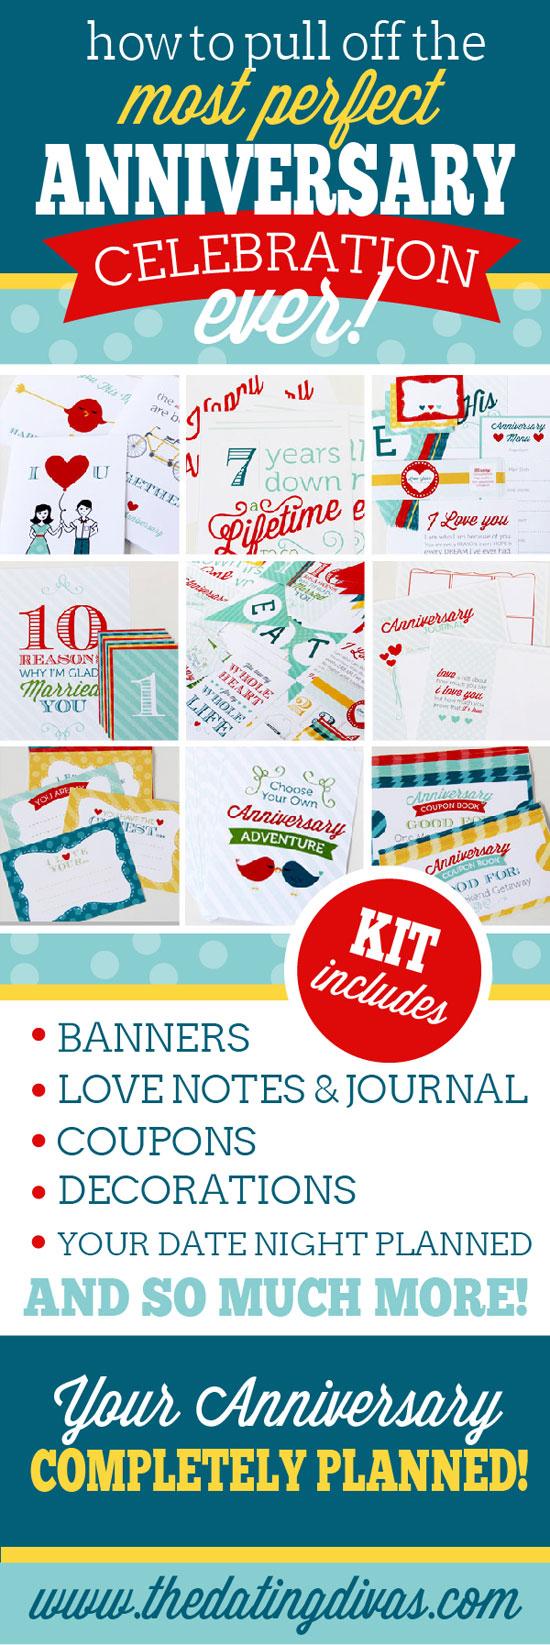 Anniversary-Printable-Pack-Pinterest